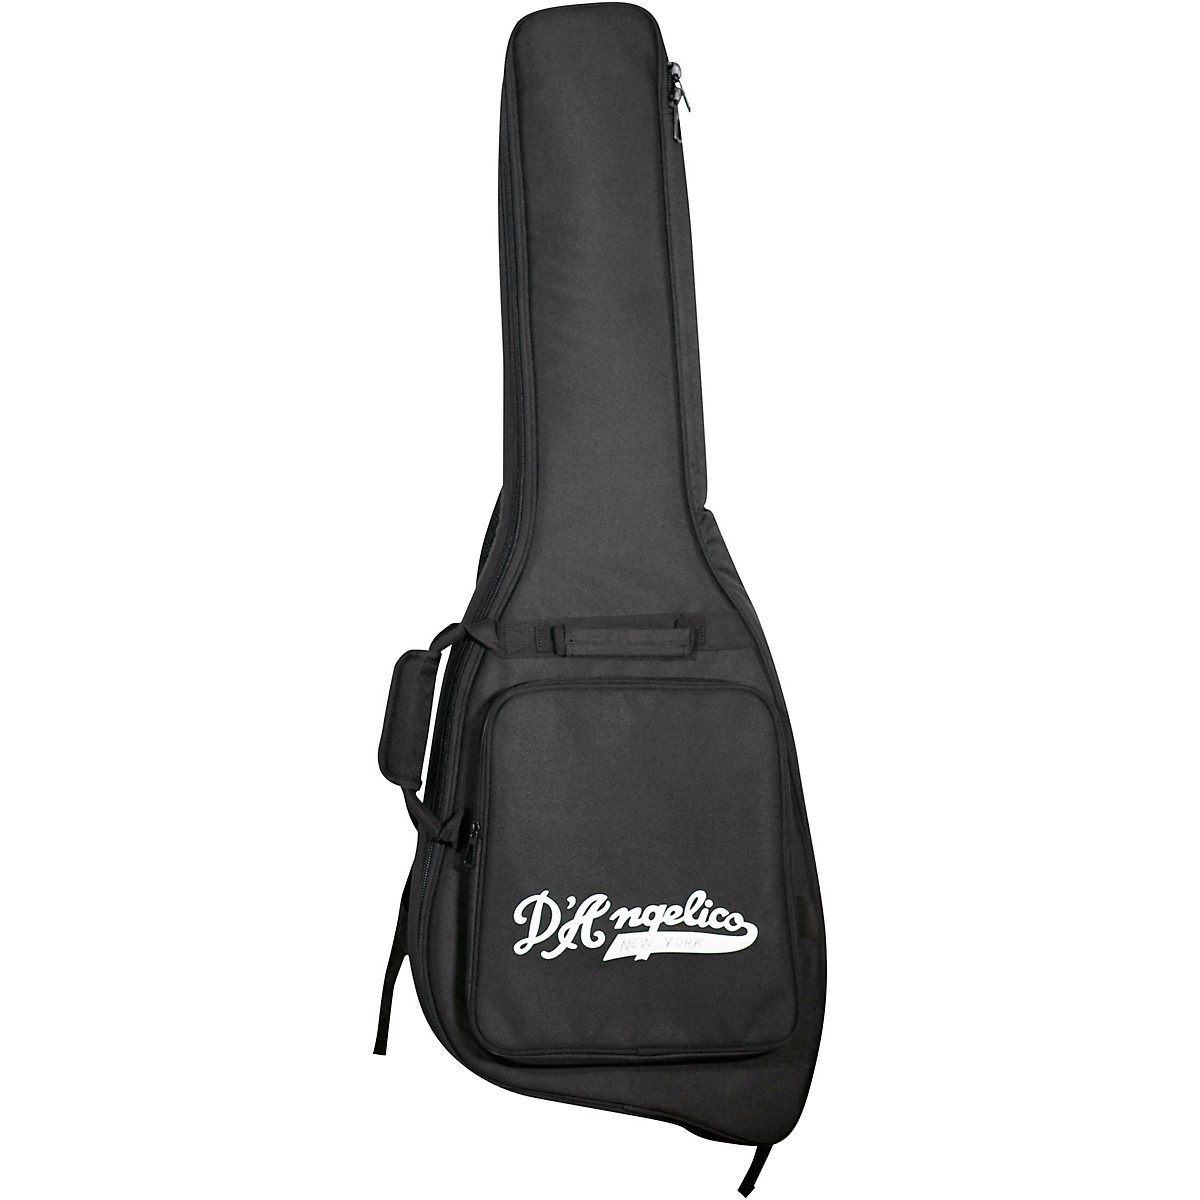 D'Angelico Premier Teardrop Electric Guitar Gig Bag